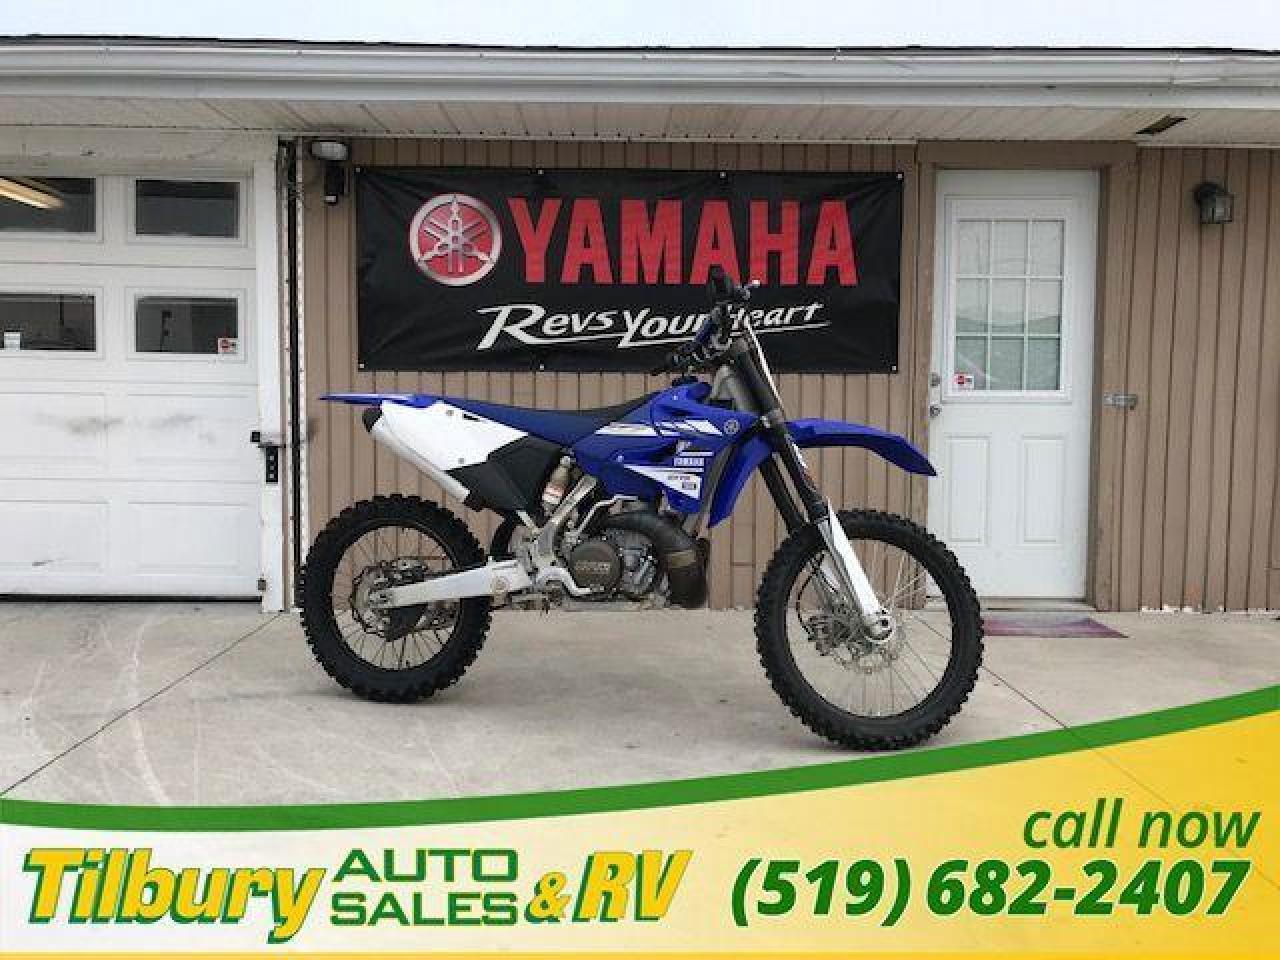 2017 Yamaha YZ250 249cc, light weight, compact engine.